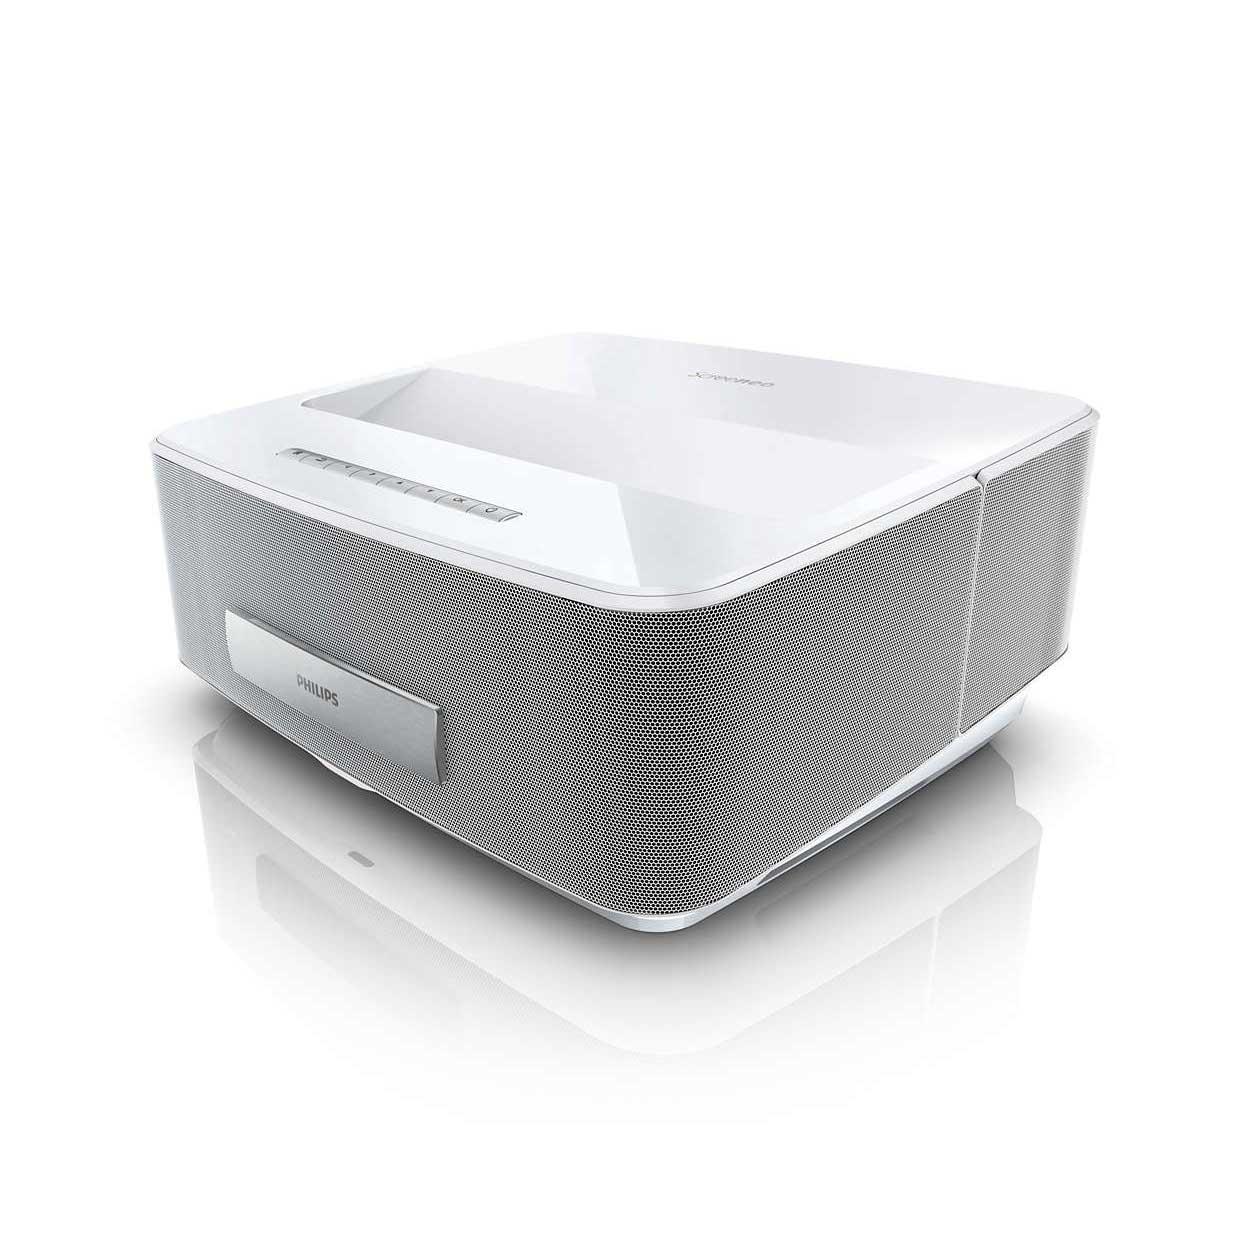 philips screeneo hdp1550 vid oprojecteur philips sur. Black Bedroom Furniture Sets. Home Design Ideas